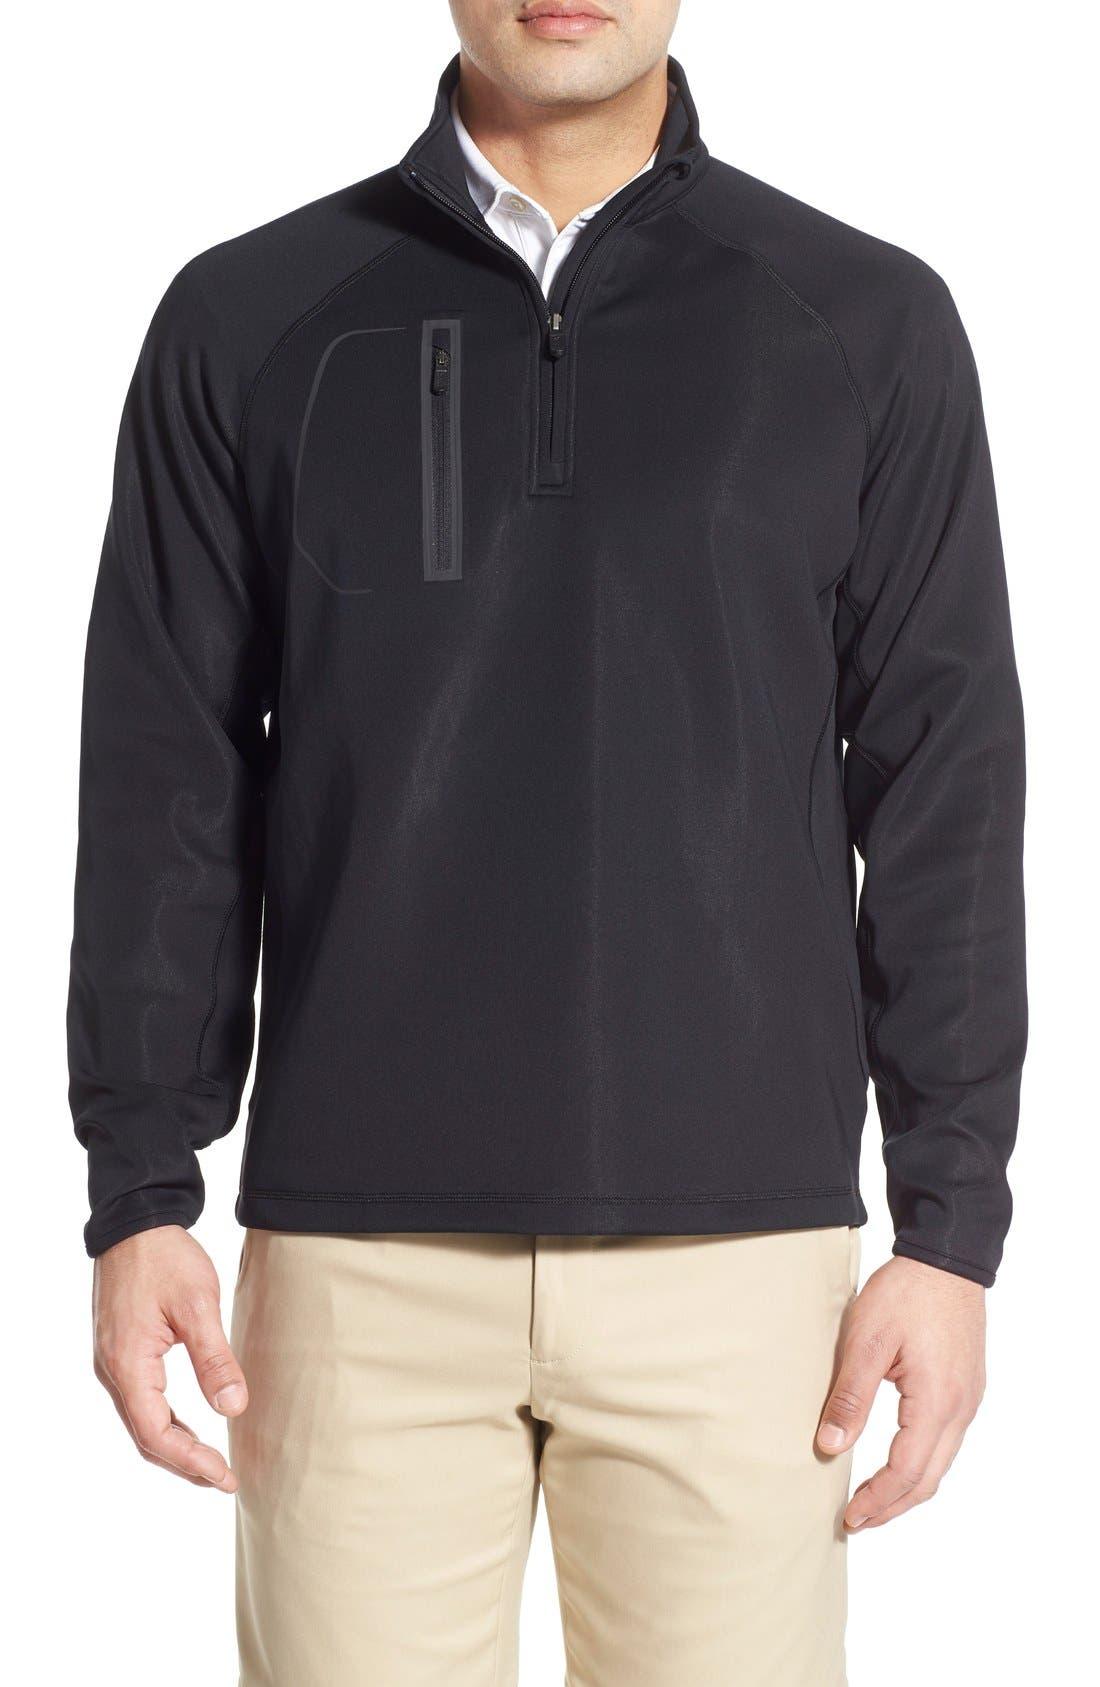 XH2O Crawford Stretch Quarter Zip Golf Pullover,                         Main,                         color, Black